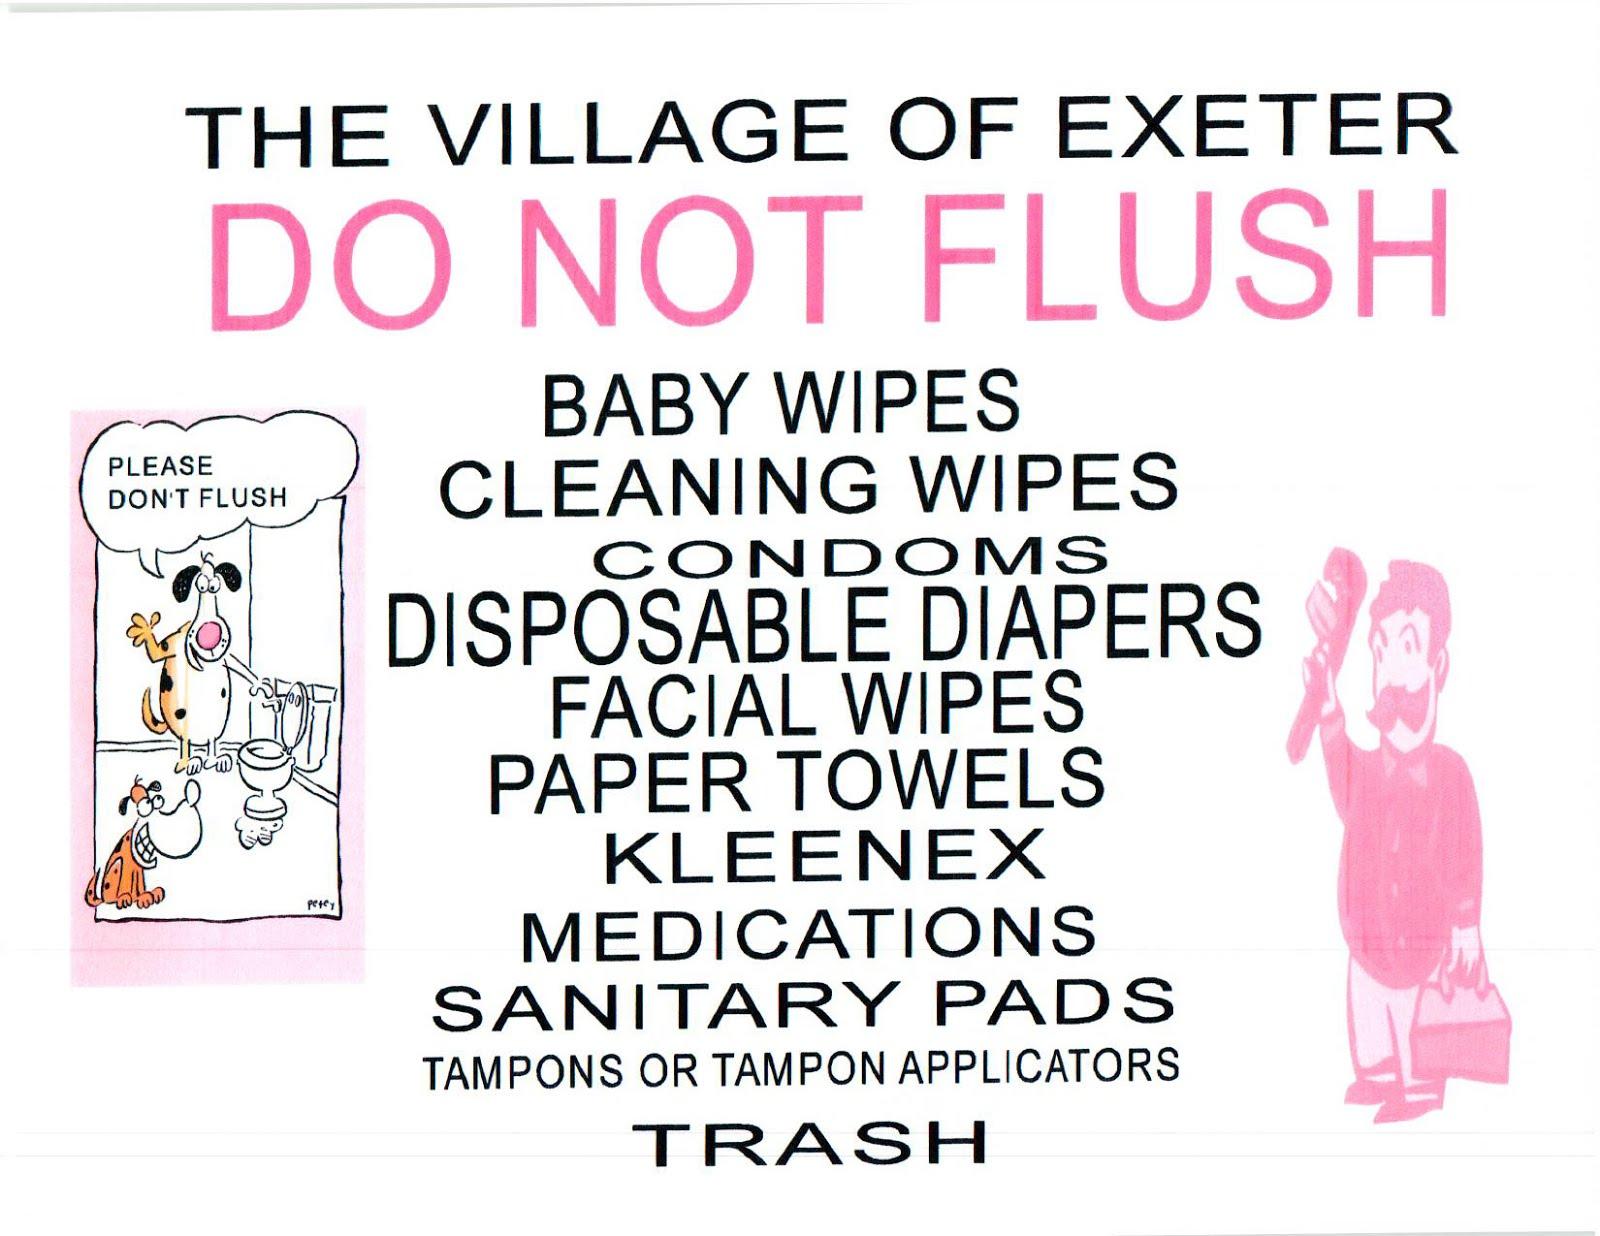 NO FLUSH